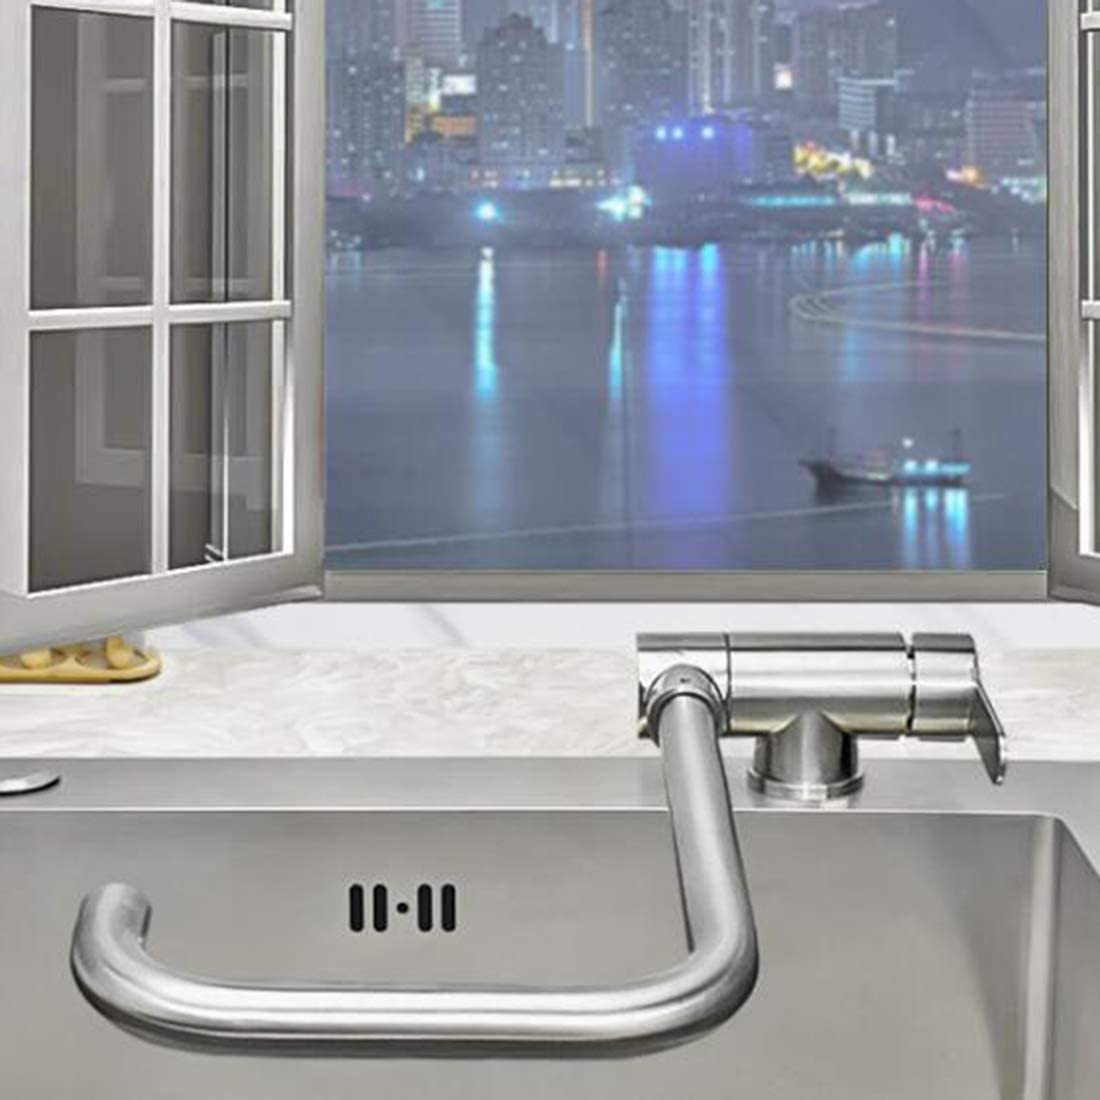 304 Stainless Steel Kitchen Without Window Taps Sink Sink dishwashing dishwashing Basin Pool Folding Inner Window revolving Window Taps@Black Seven-Tube Open Window